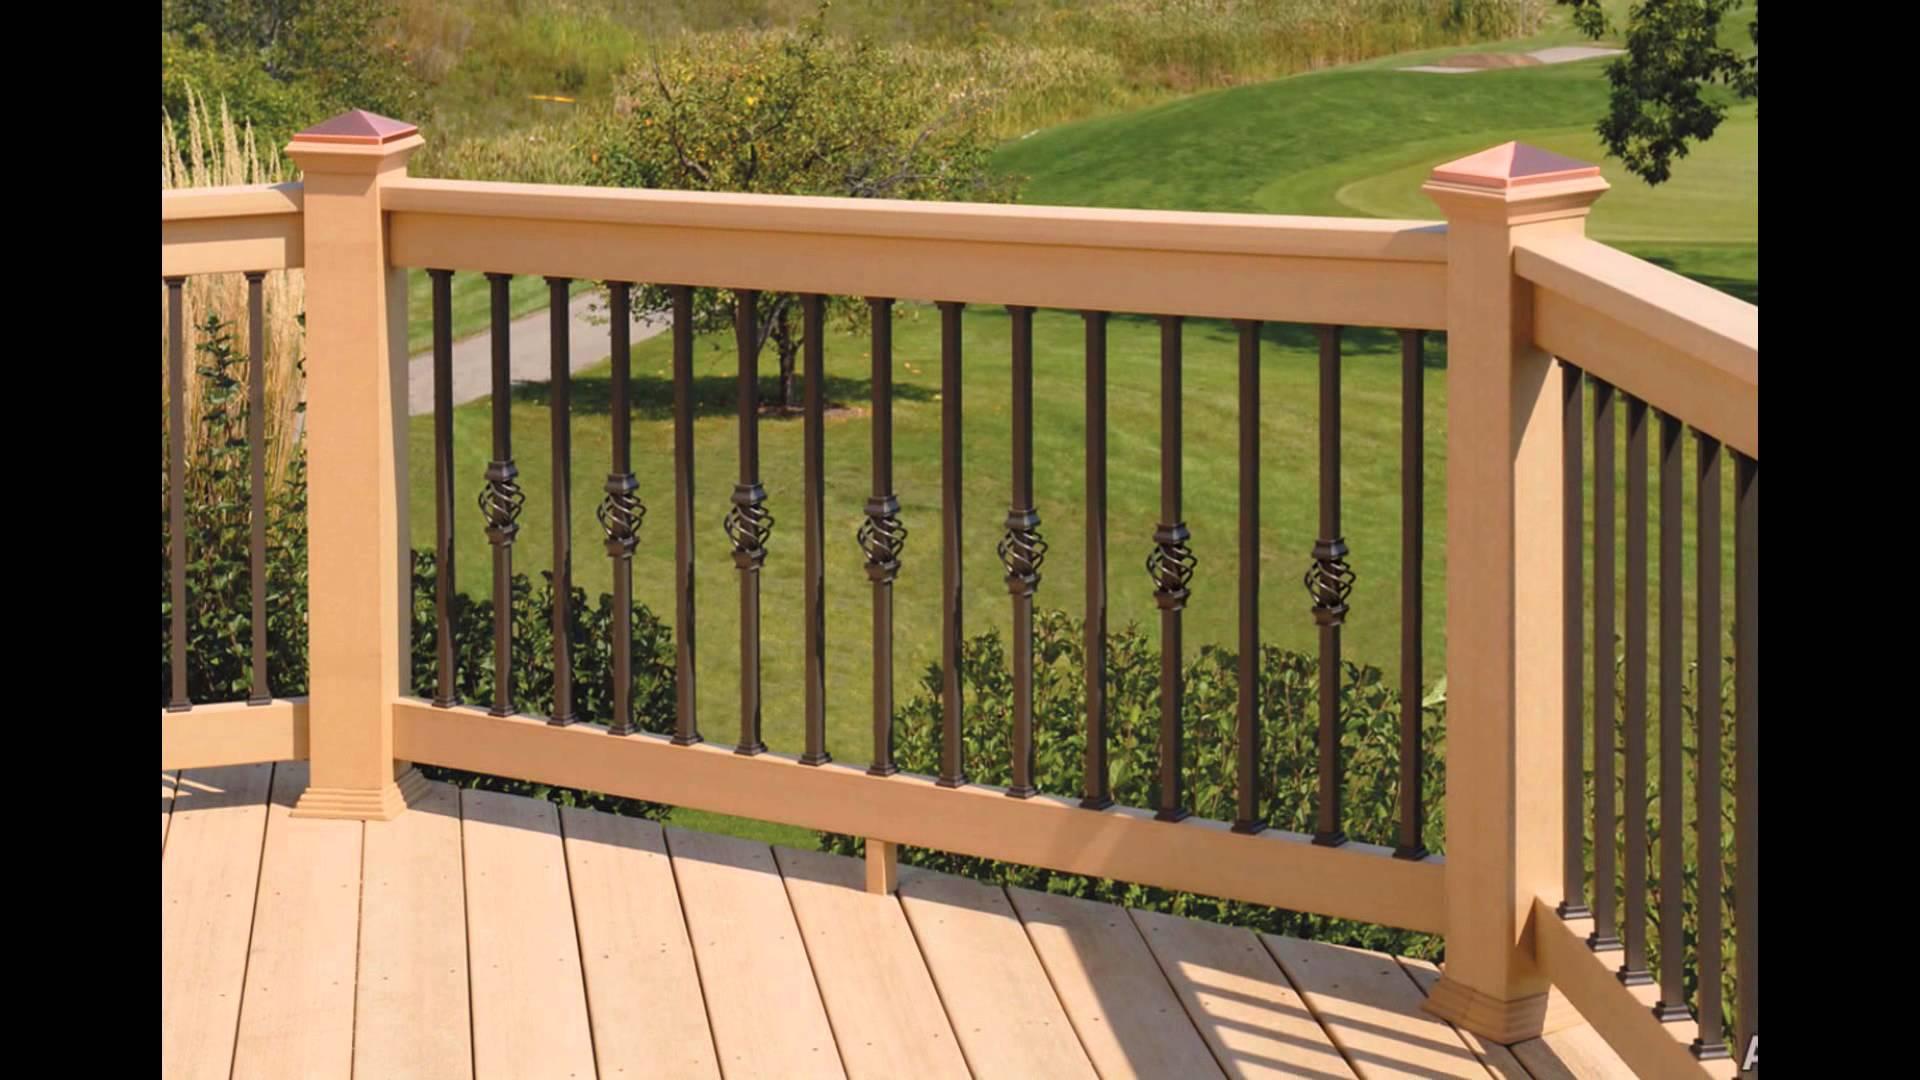 wood deck designs | wood deck railing designs - youtube KPOJMJQ